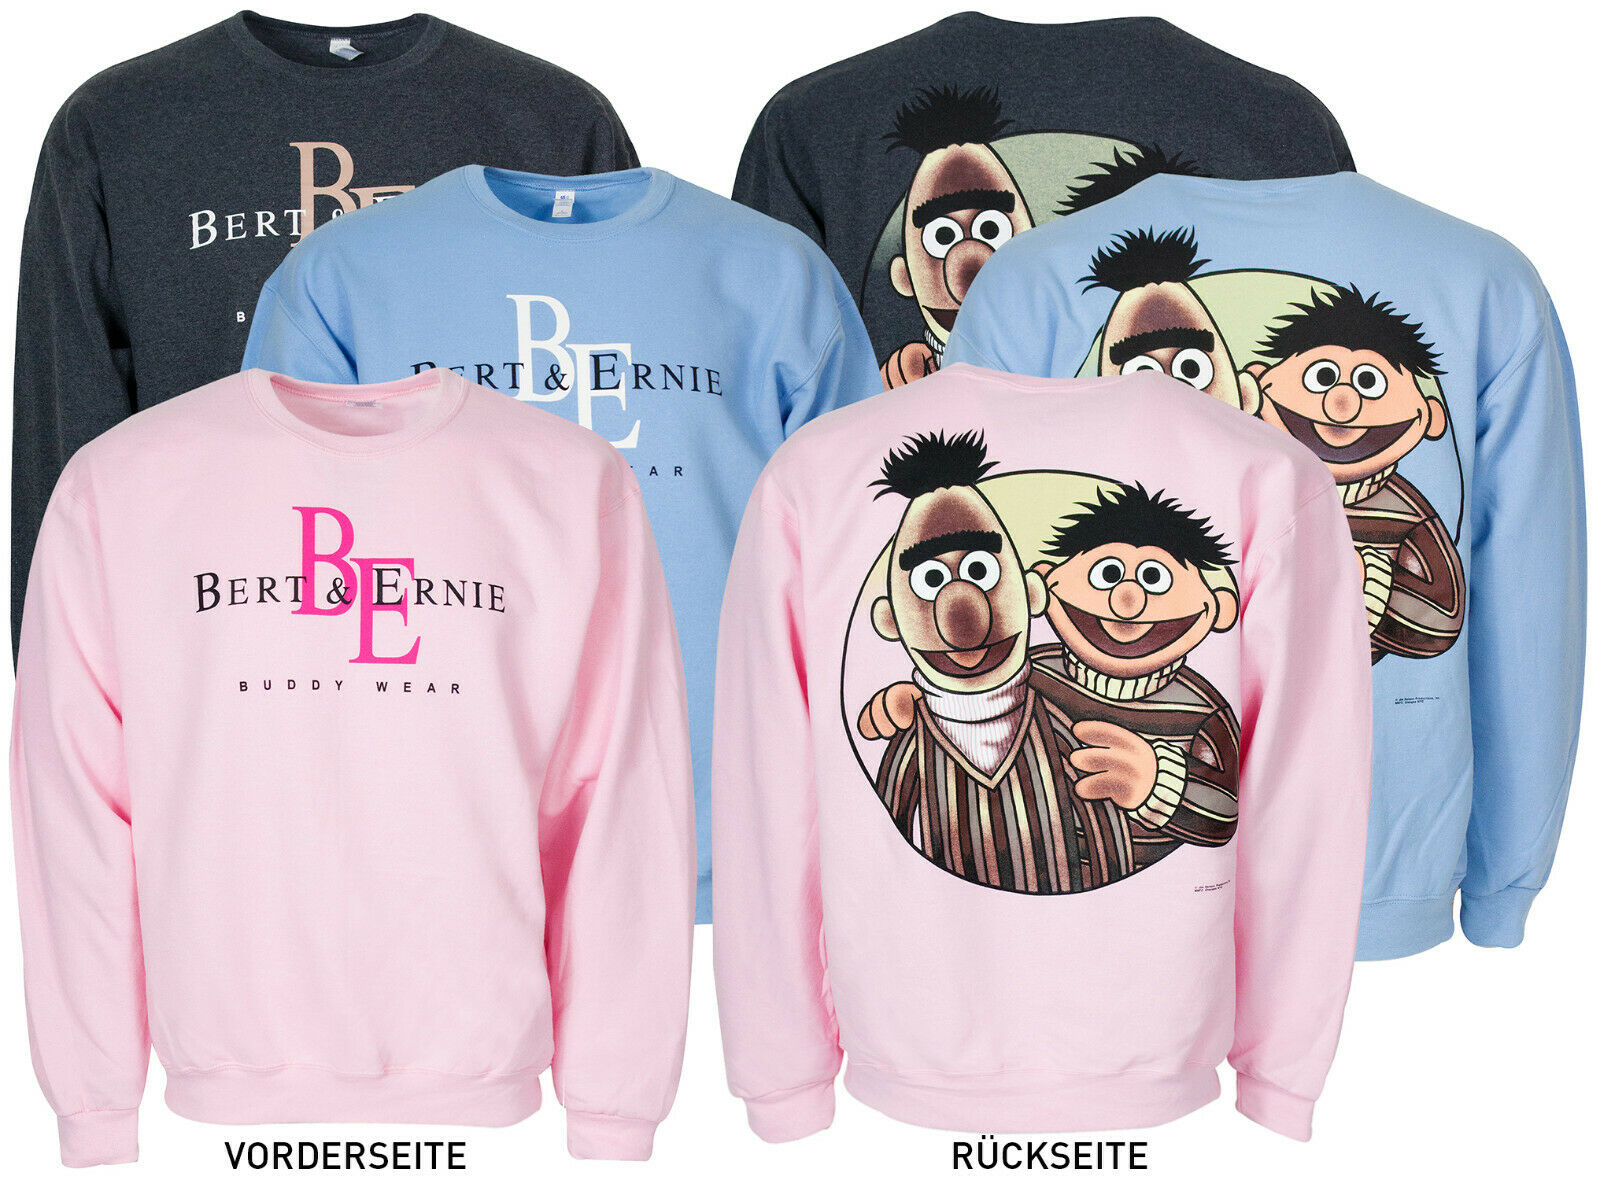 Ernie & Bert Pullover Sweatshirt be Bert, be Ernie, just be ! buddy wear